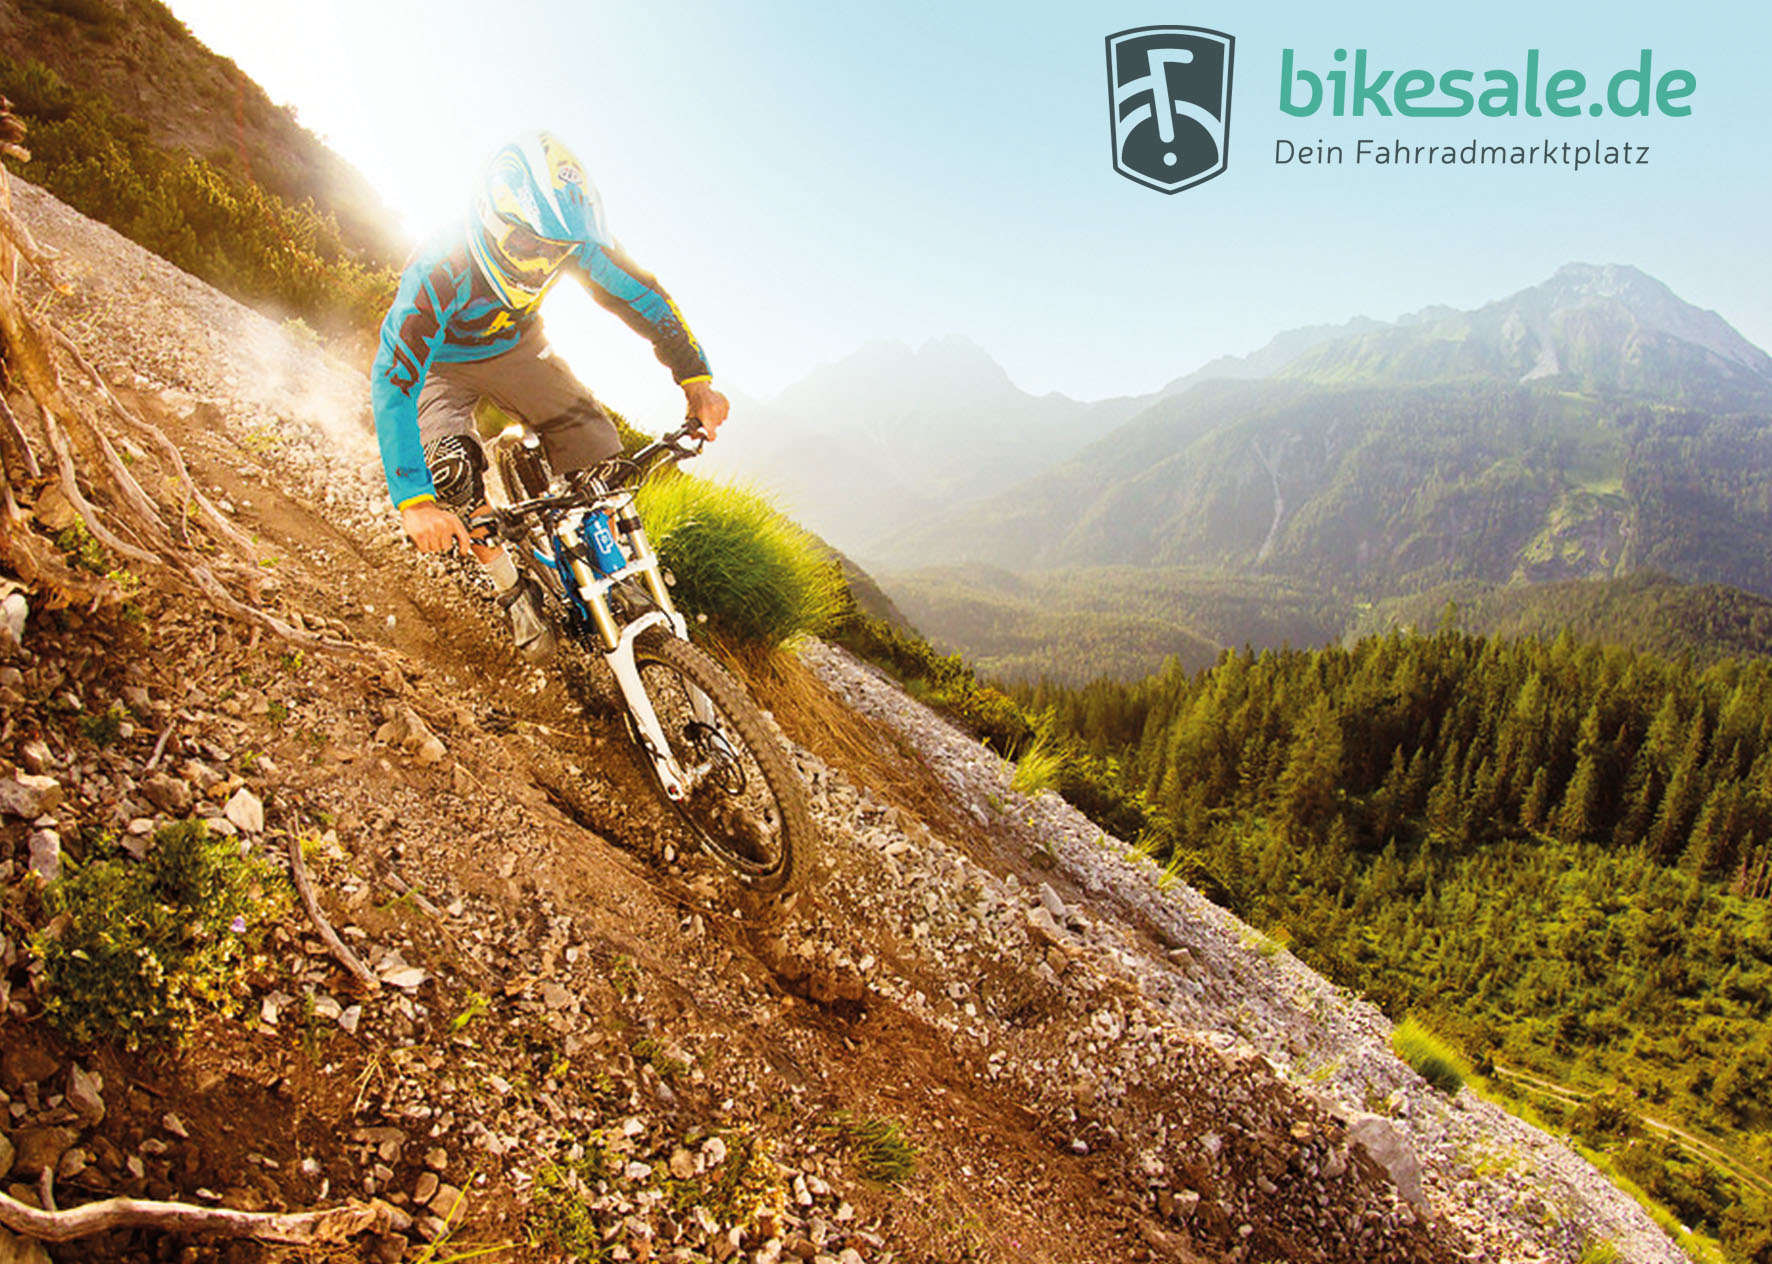 bikesale.de_MTB_300dpi_V2